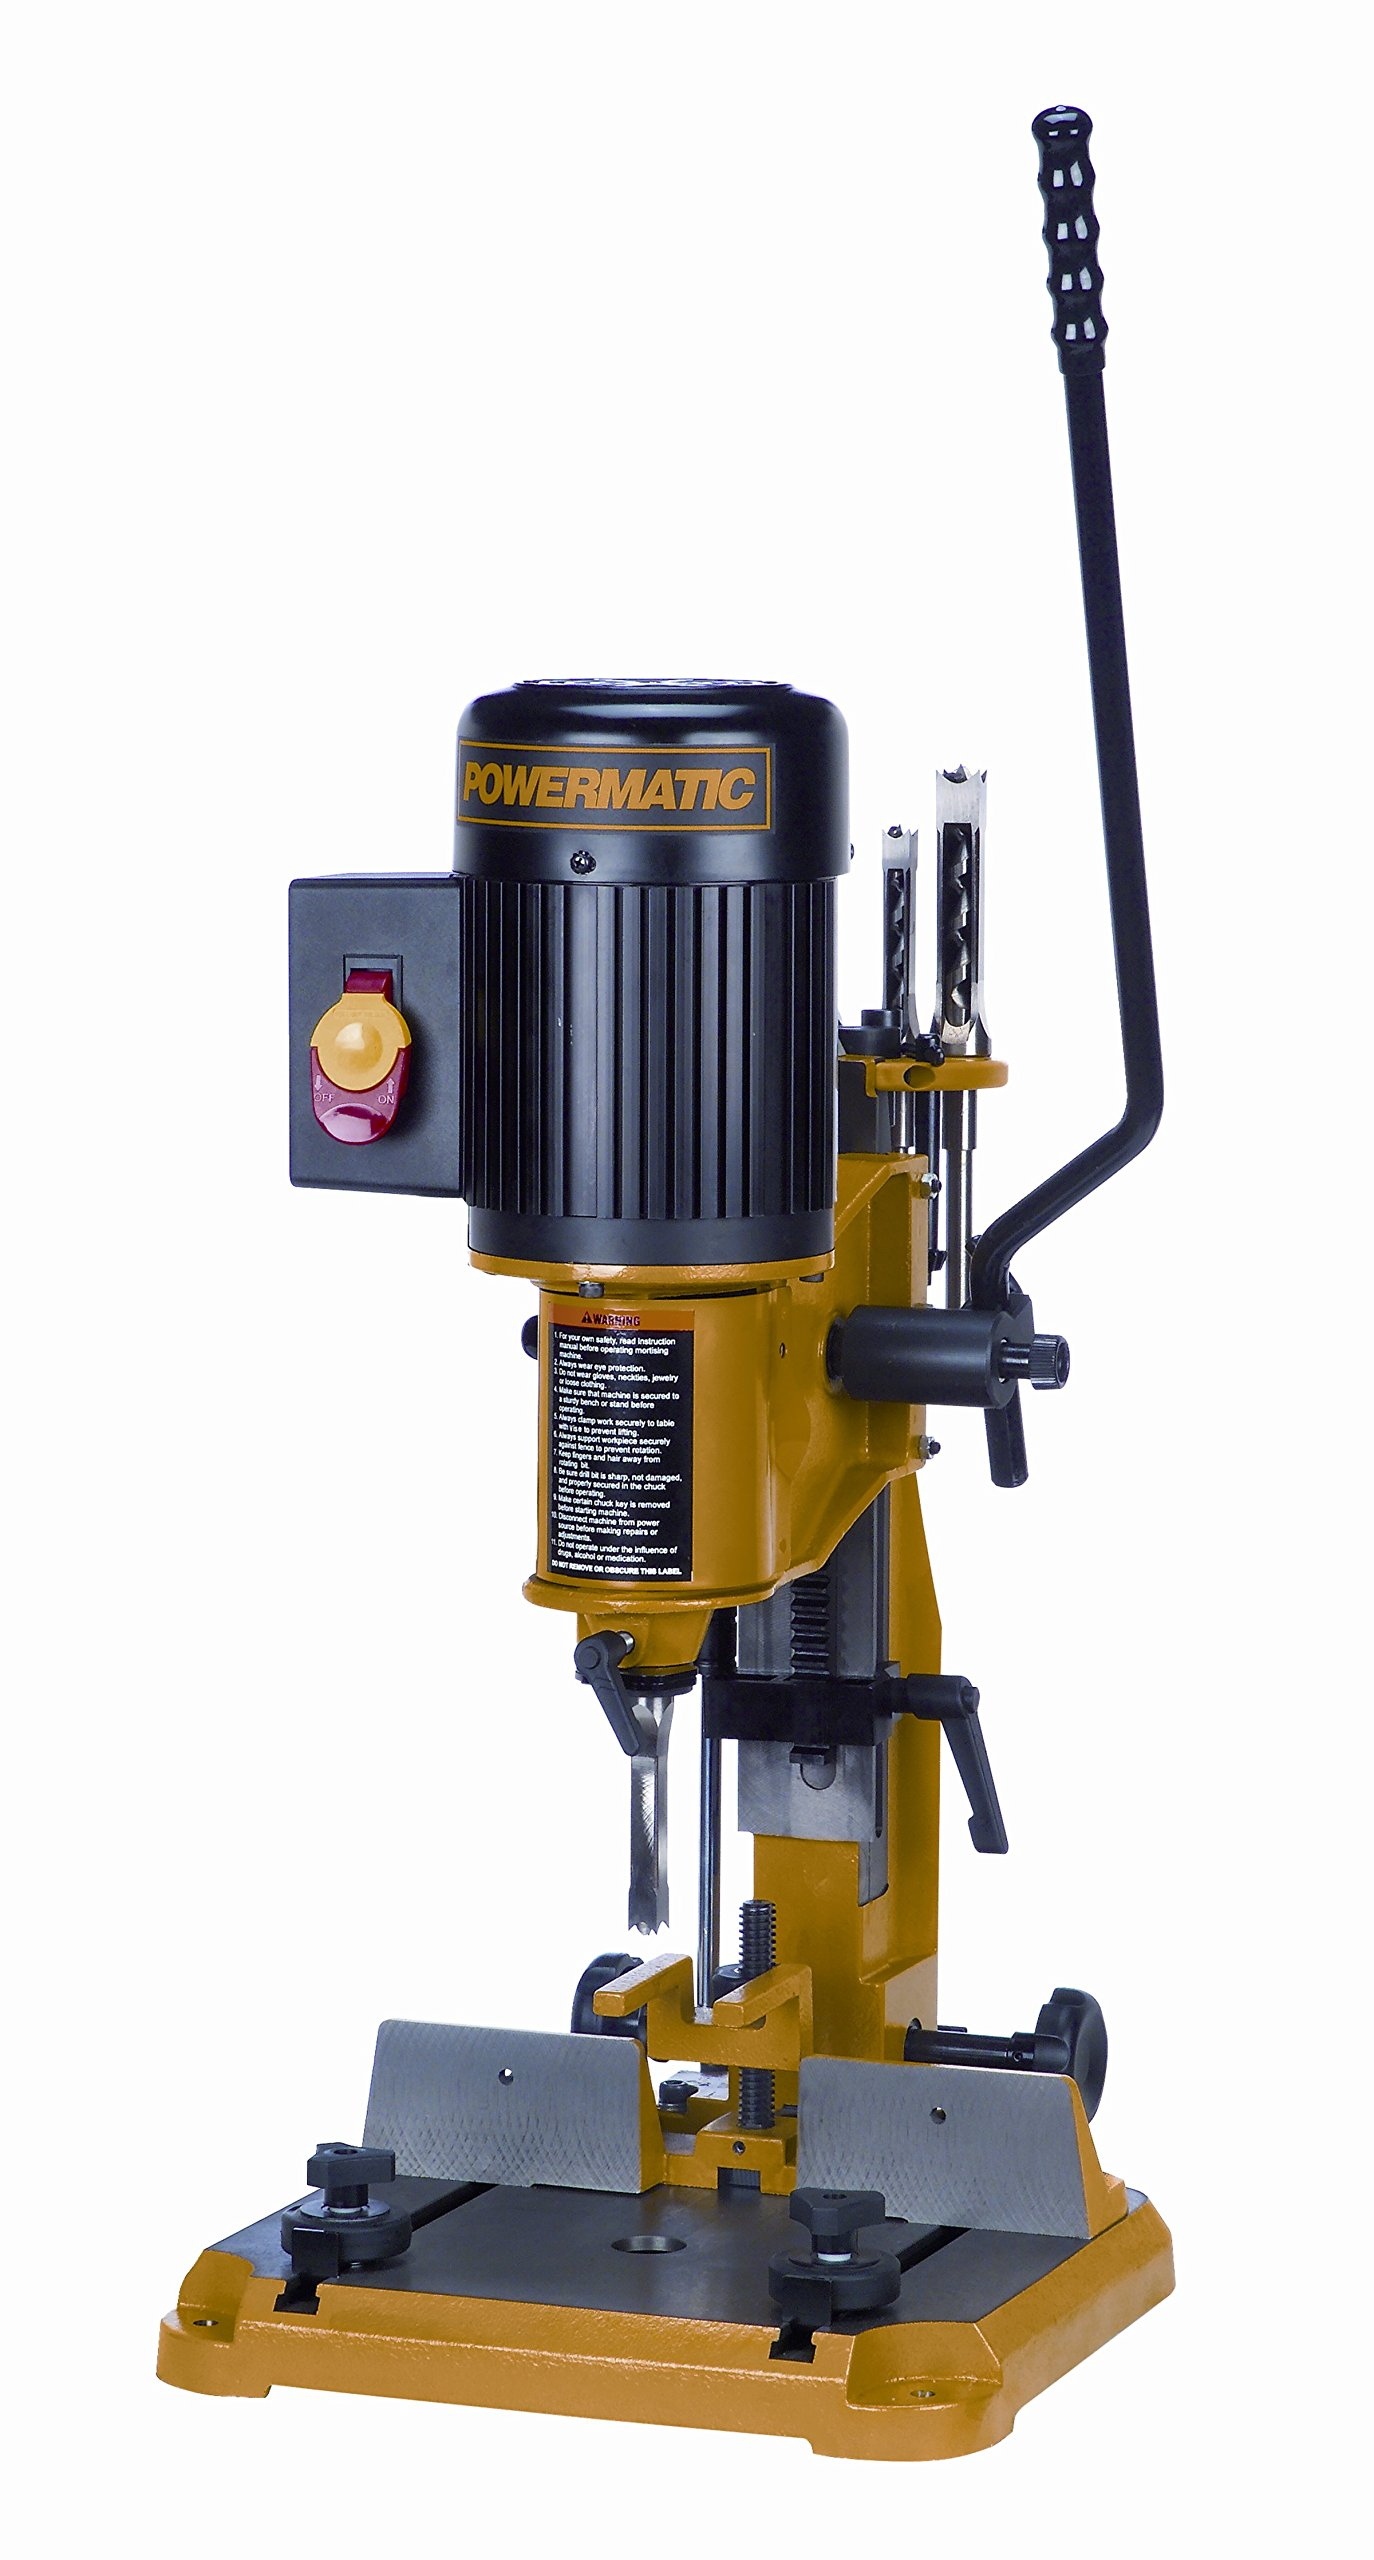 Powermatic 1791310 PM701 3/4 Horsepower Bench Mortiser by Powermatic